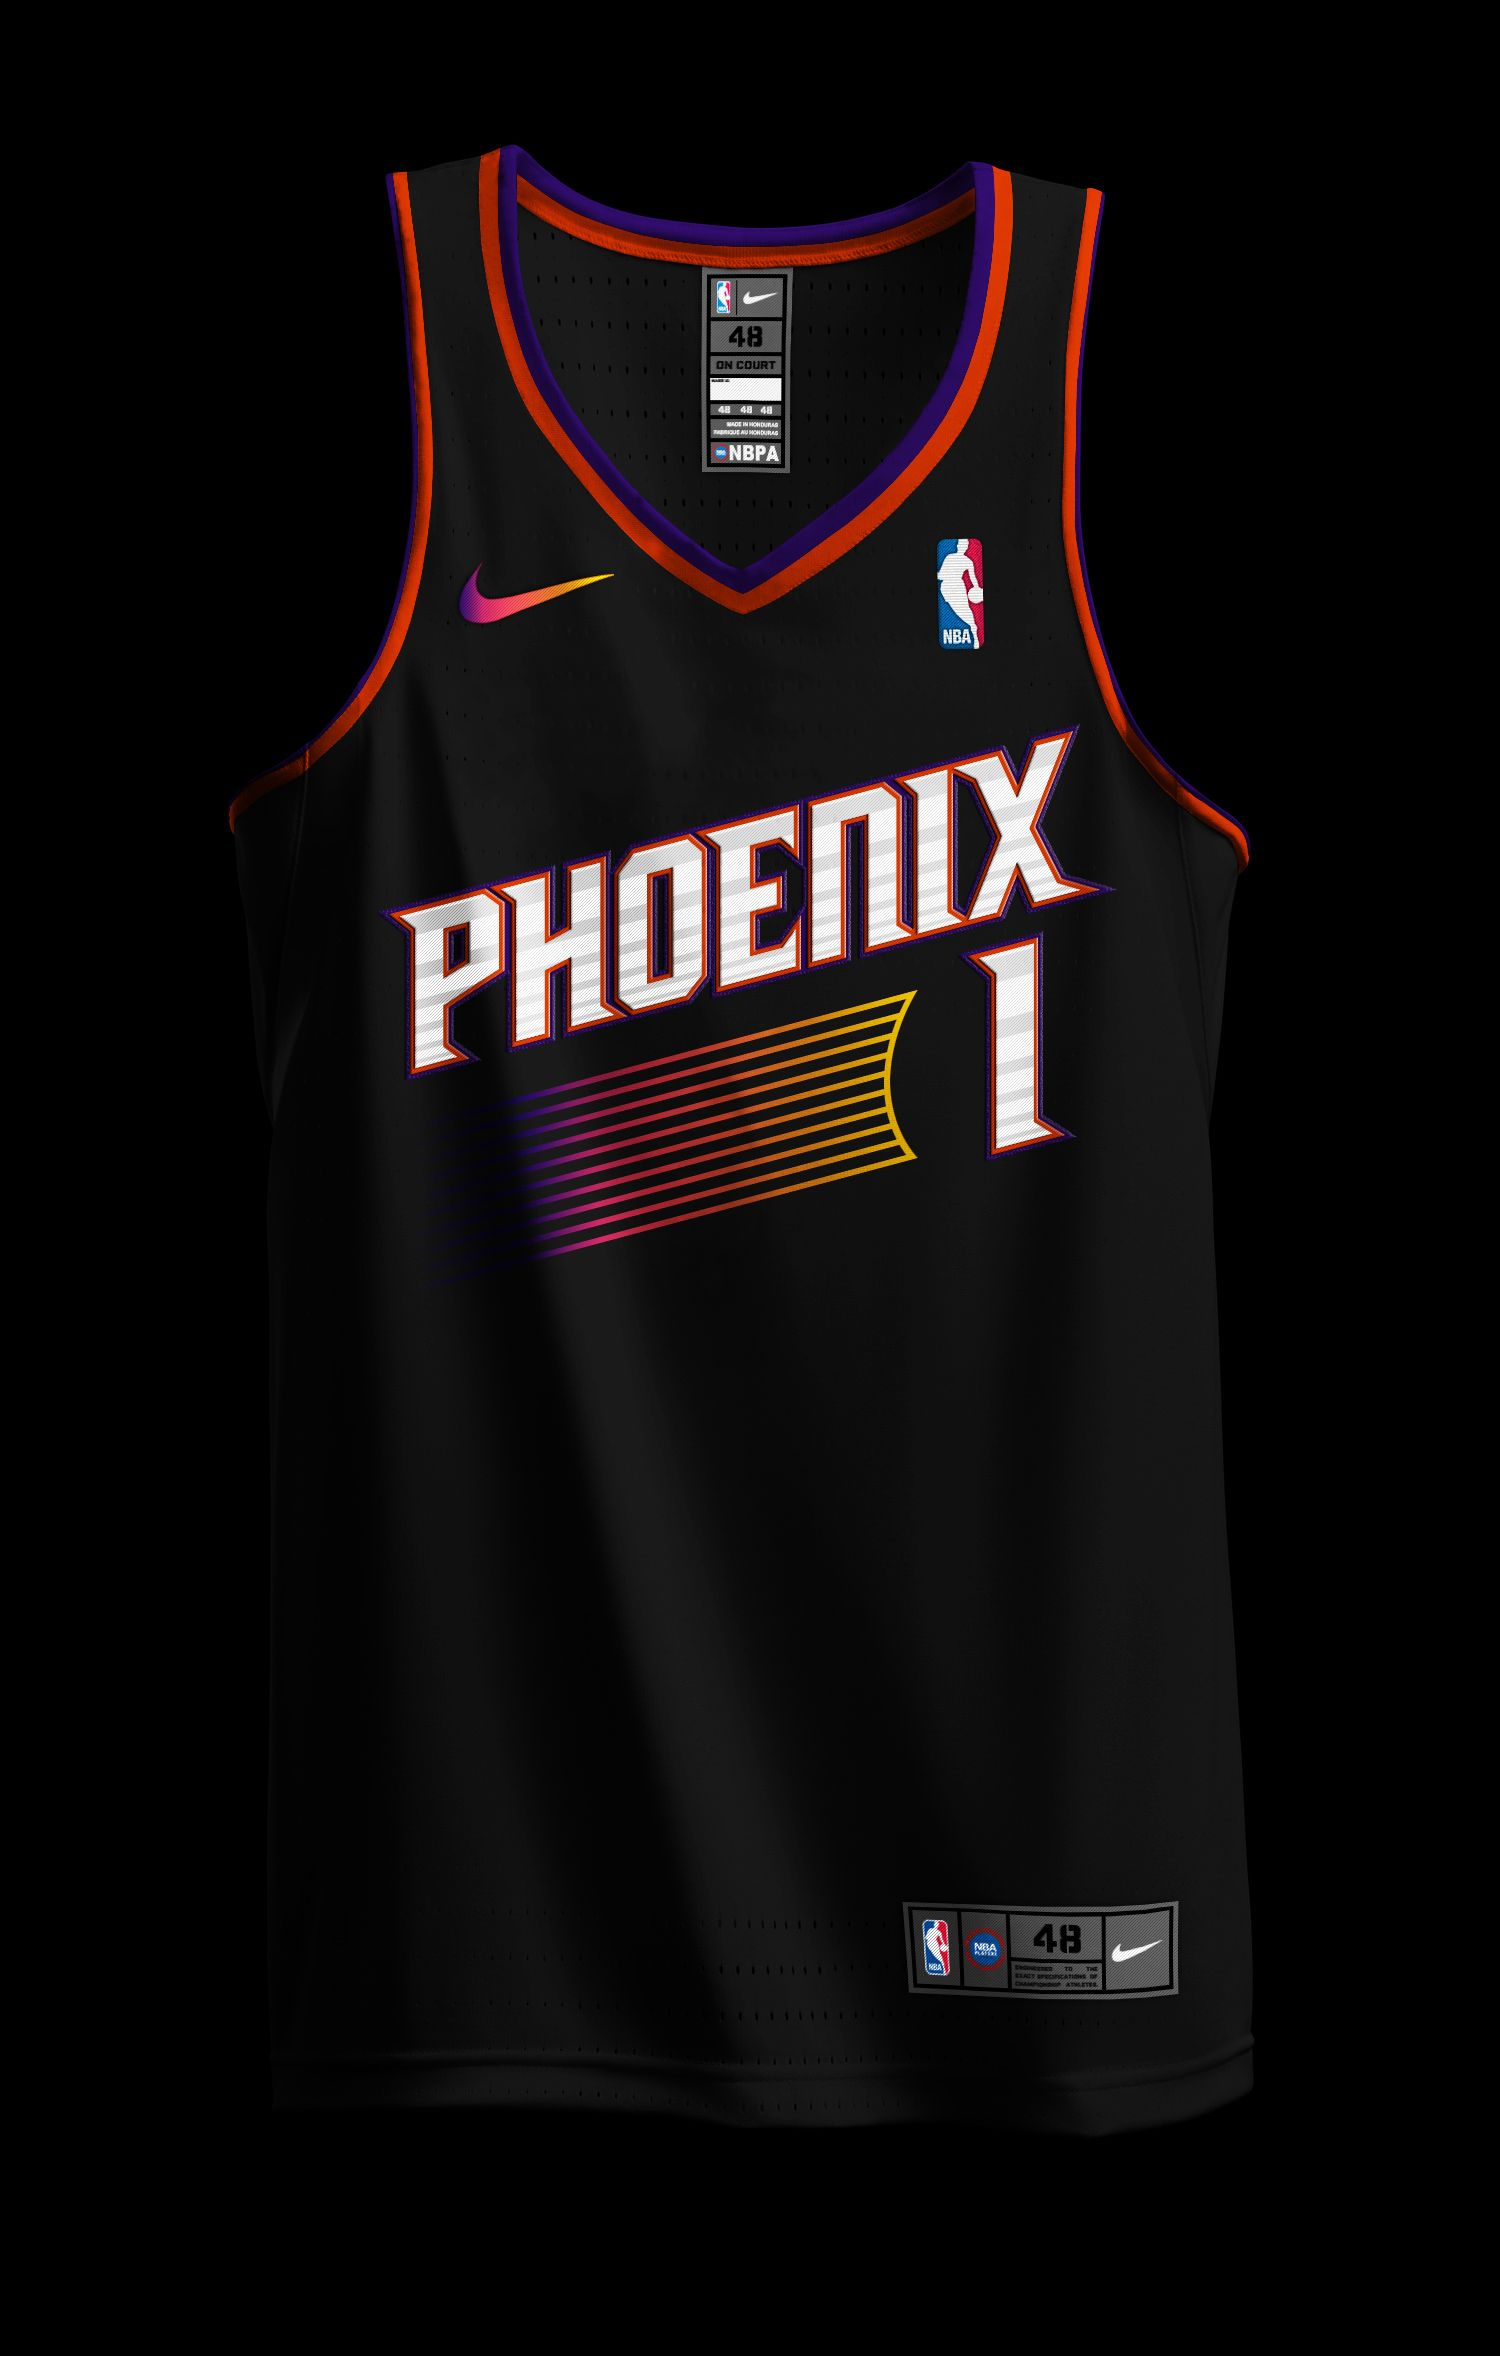 XI4fO0b.jpg Basketball design, Basketball uniforms